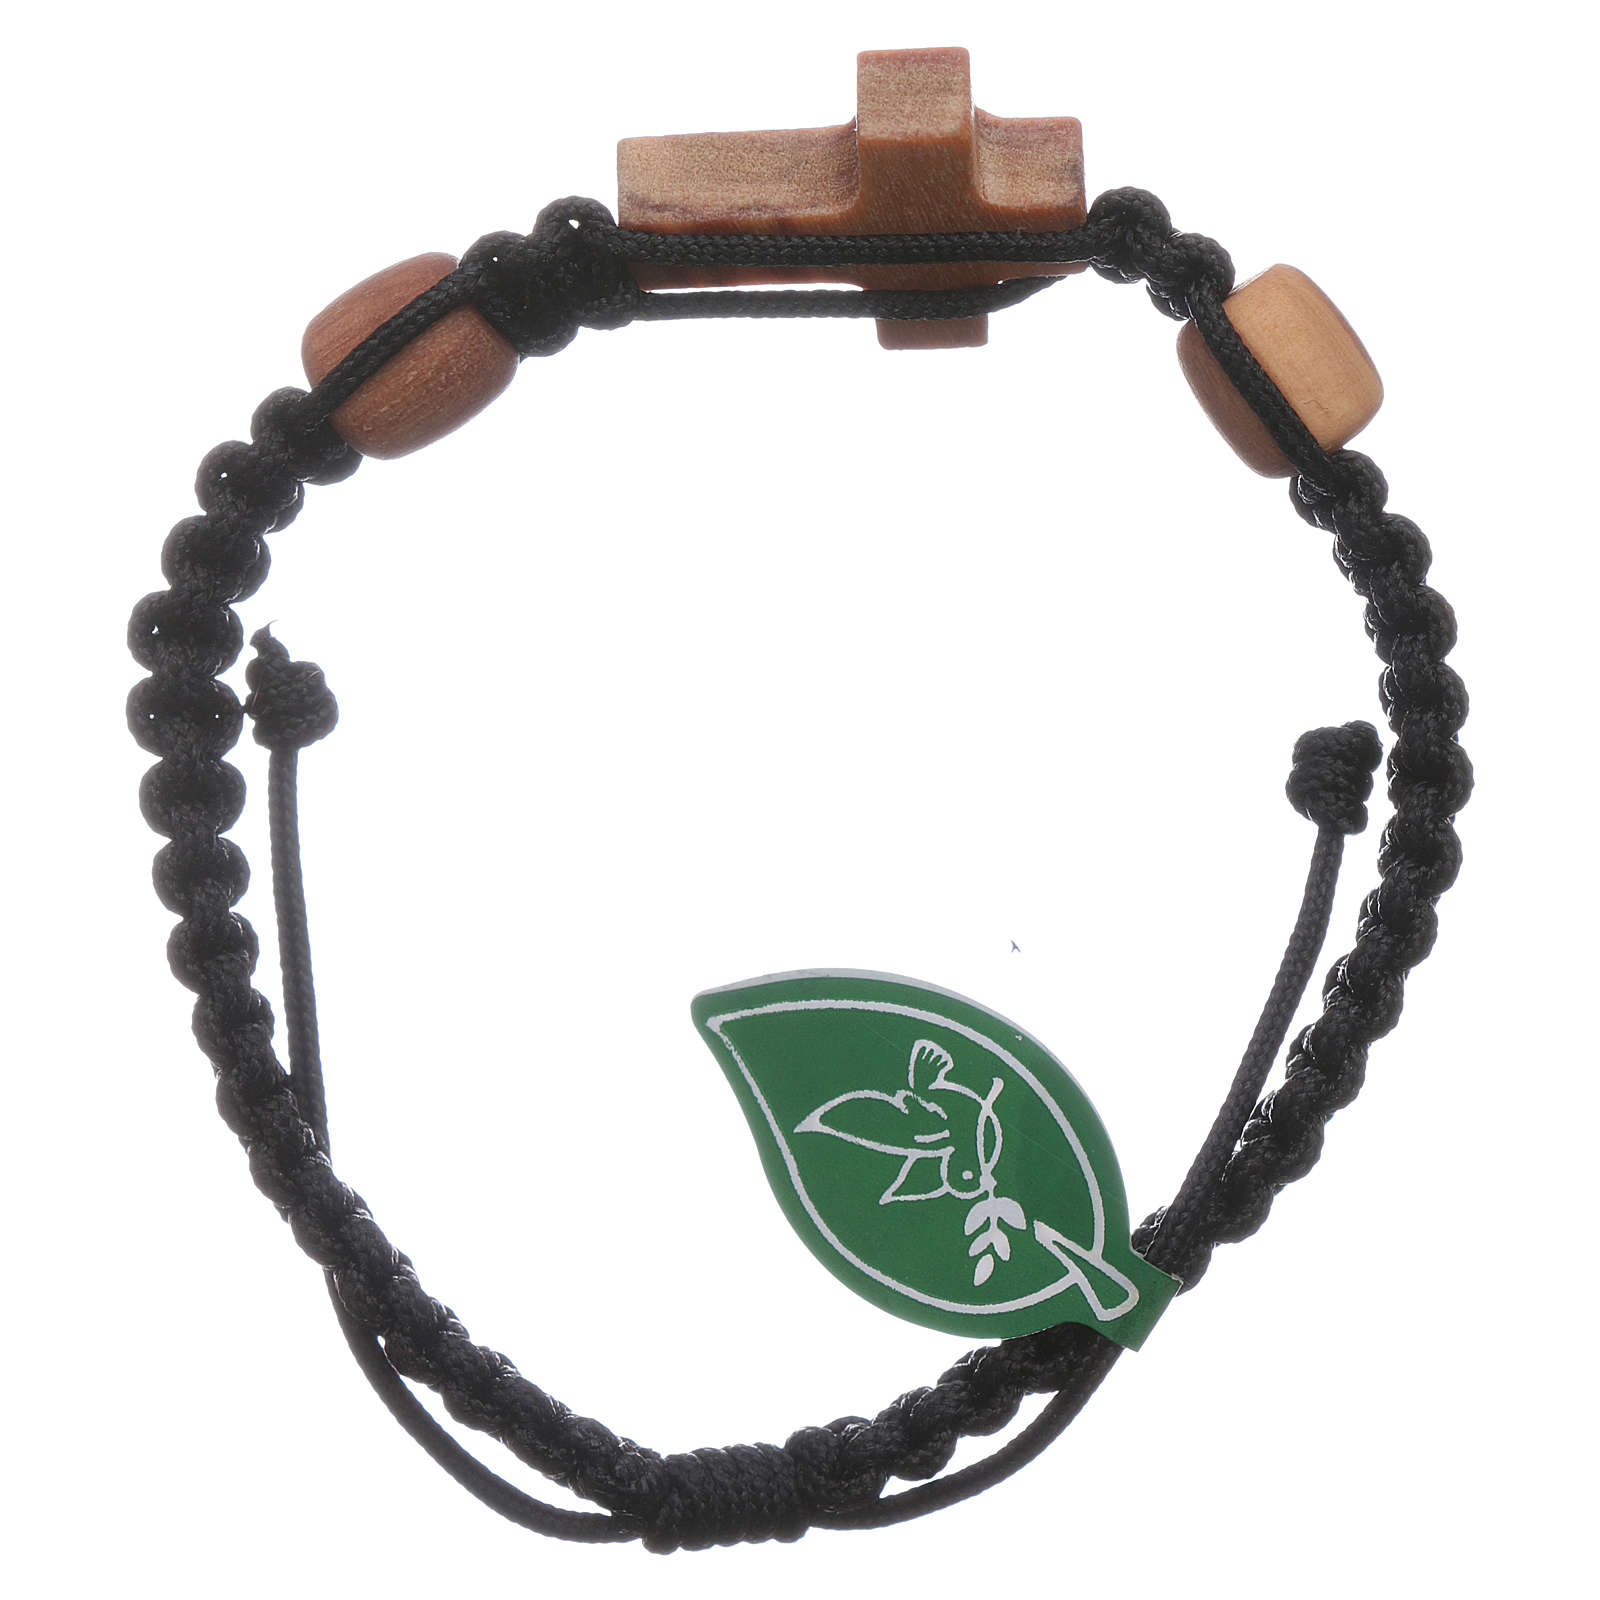 Bracciale Medjugorje croce ulivo 2 grani corda nera 4